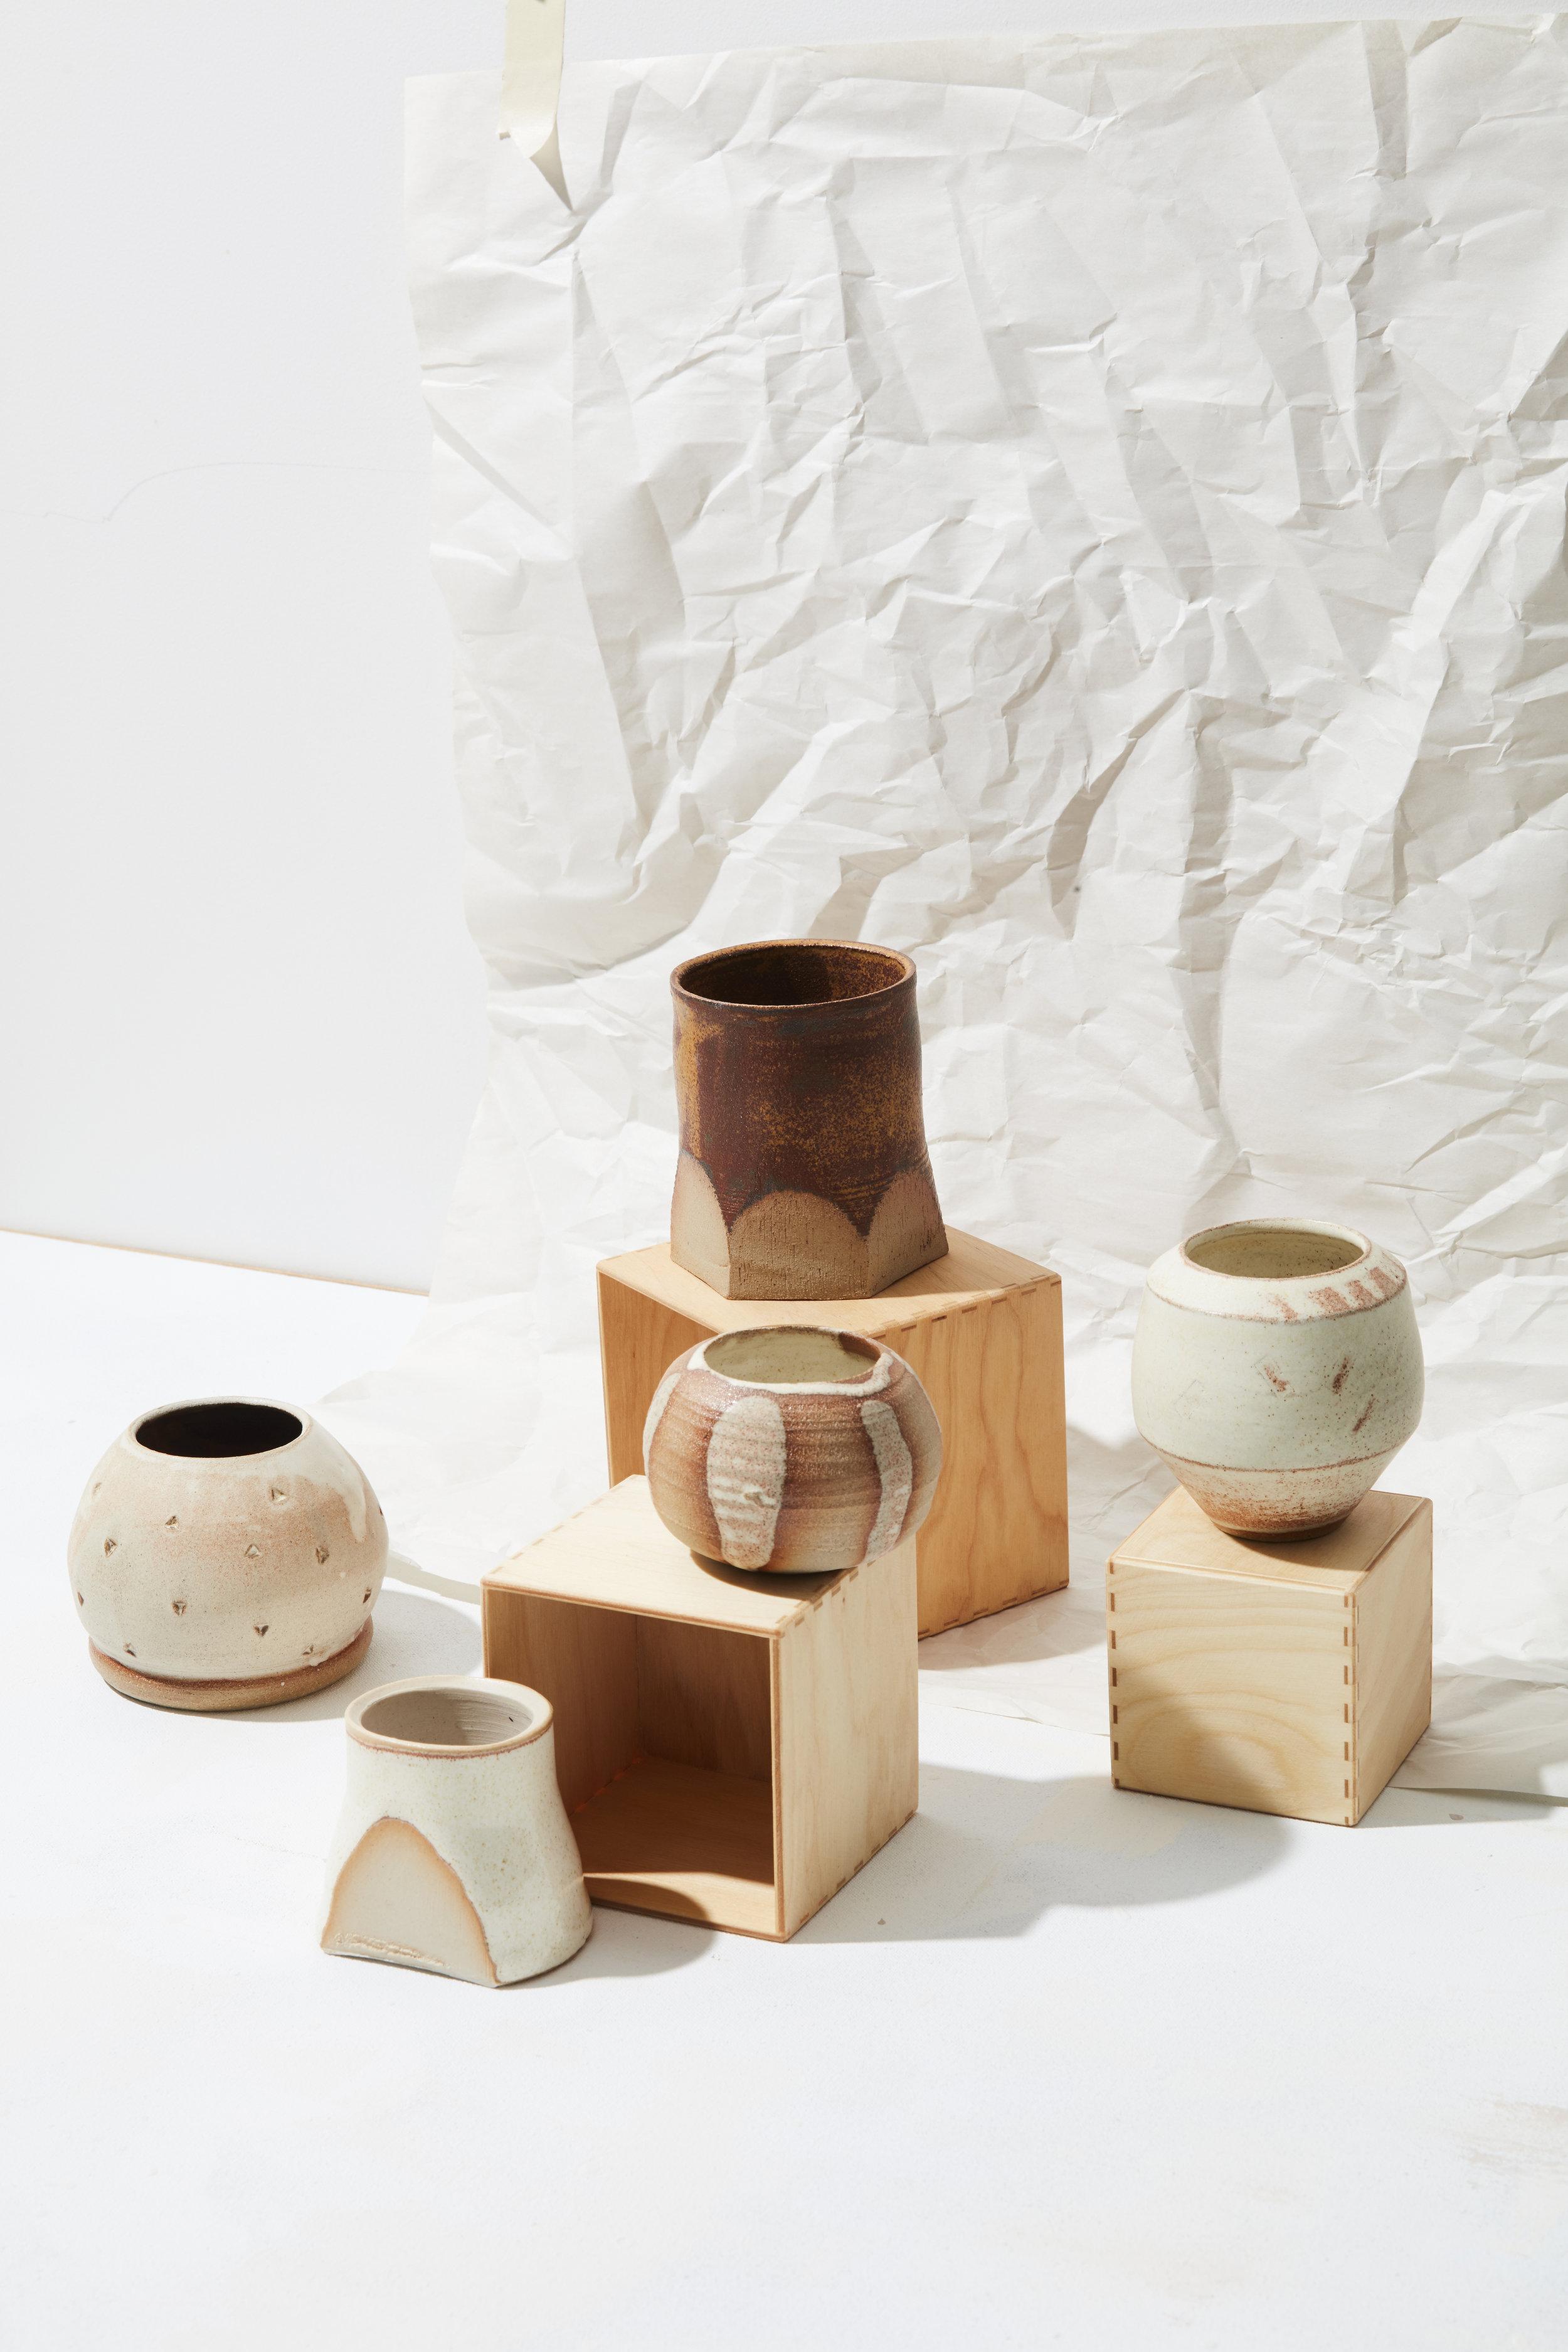 Pegboard_Pottery25634.JPG